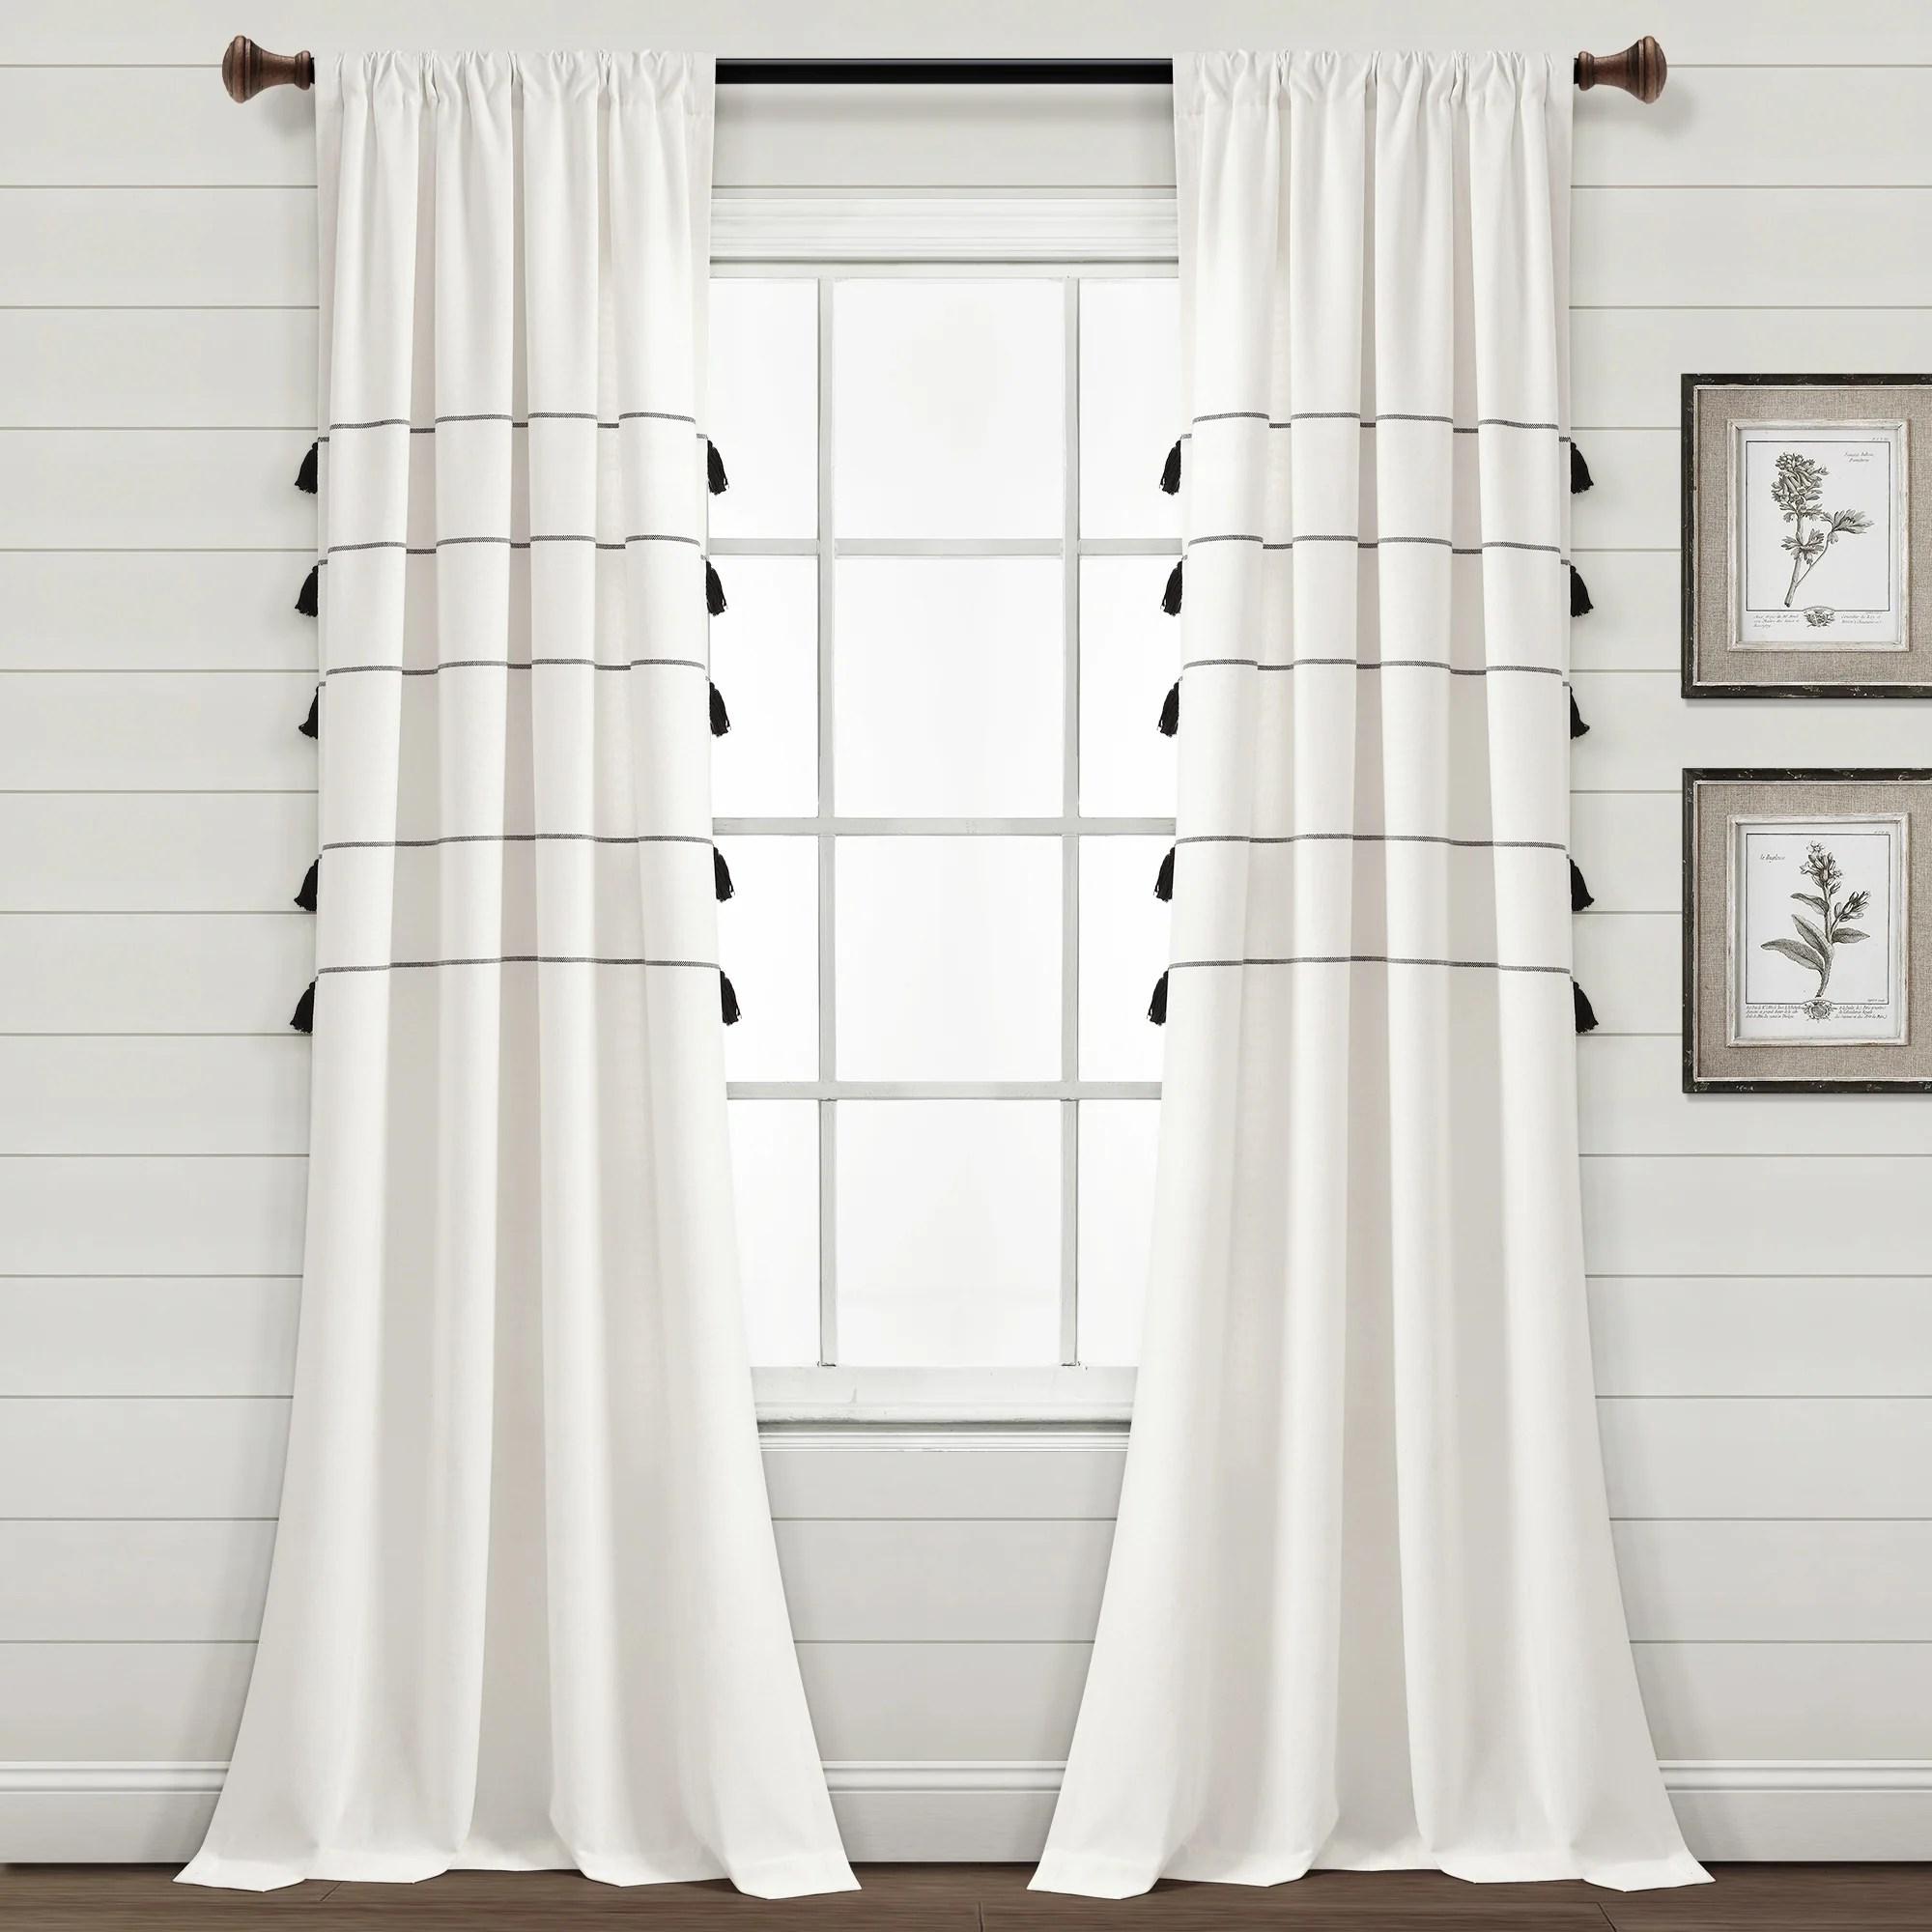 farmhouse boho stripe woven tassel yarn dyed cotton window curtain panel set 84 x 42 ivory black